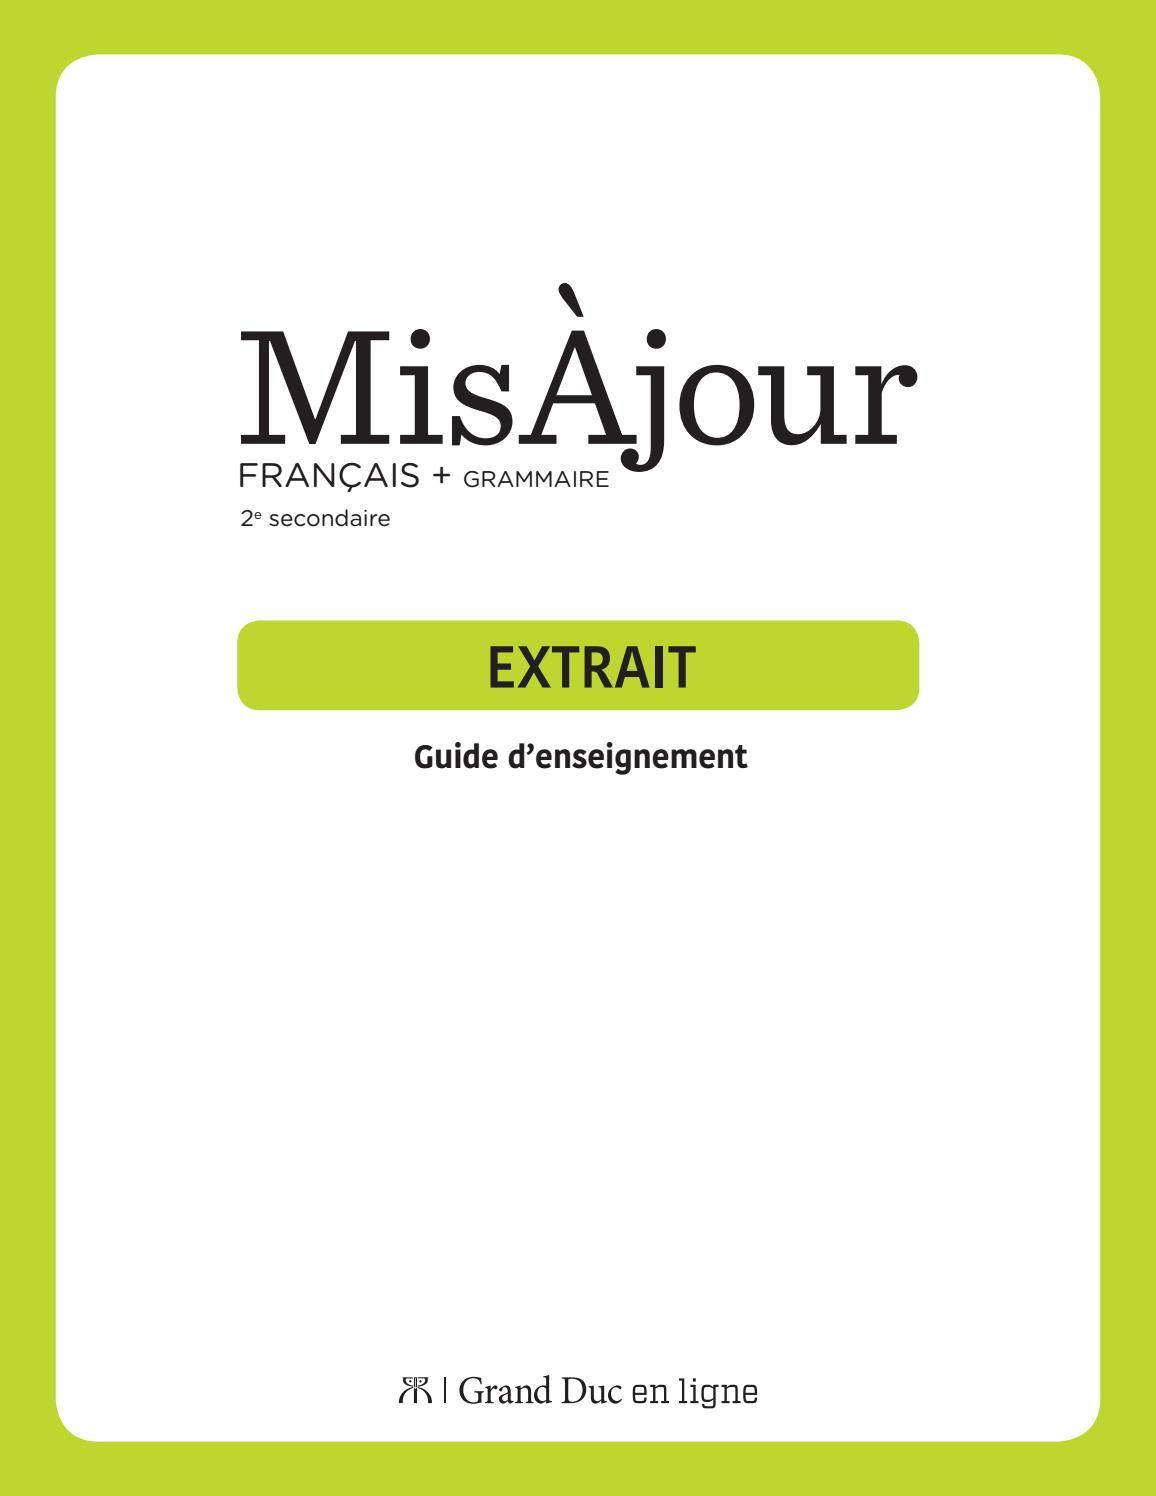 Misajour Francais Grammaire 2 Guide D Enseignement By Editions Grand Duc Issuu